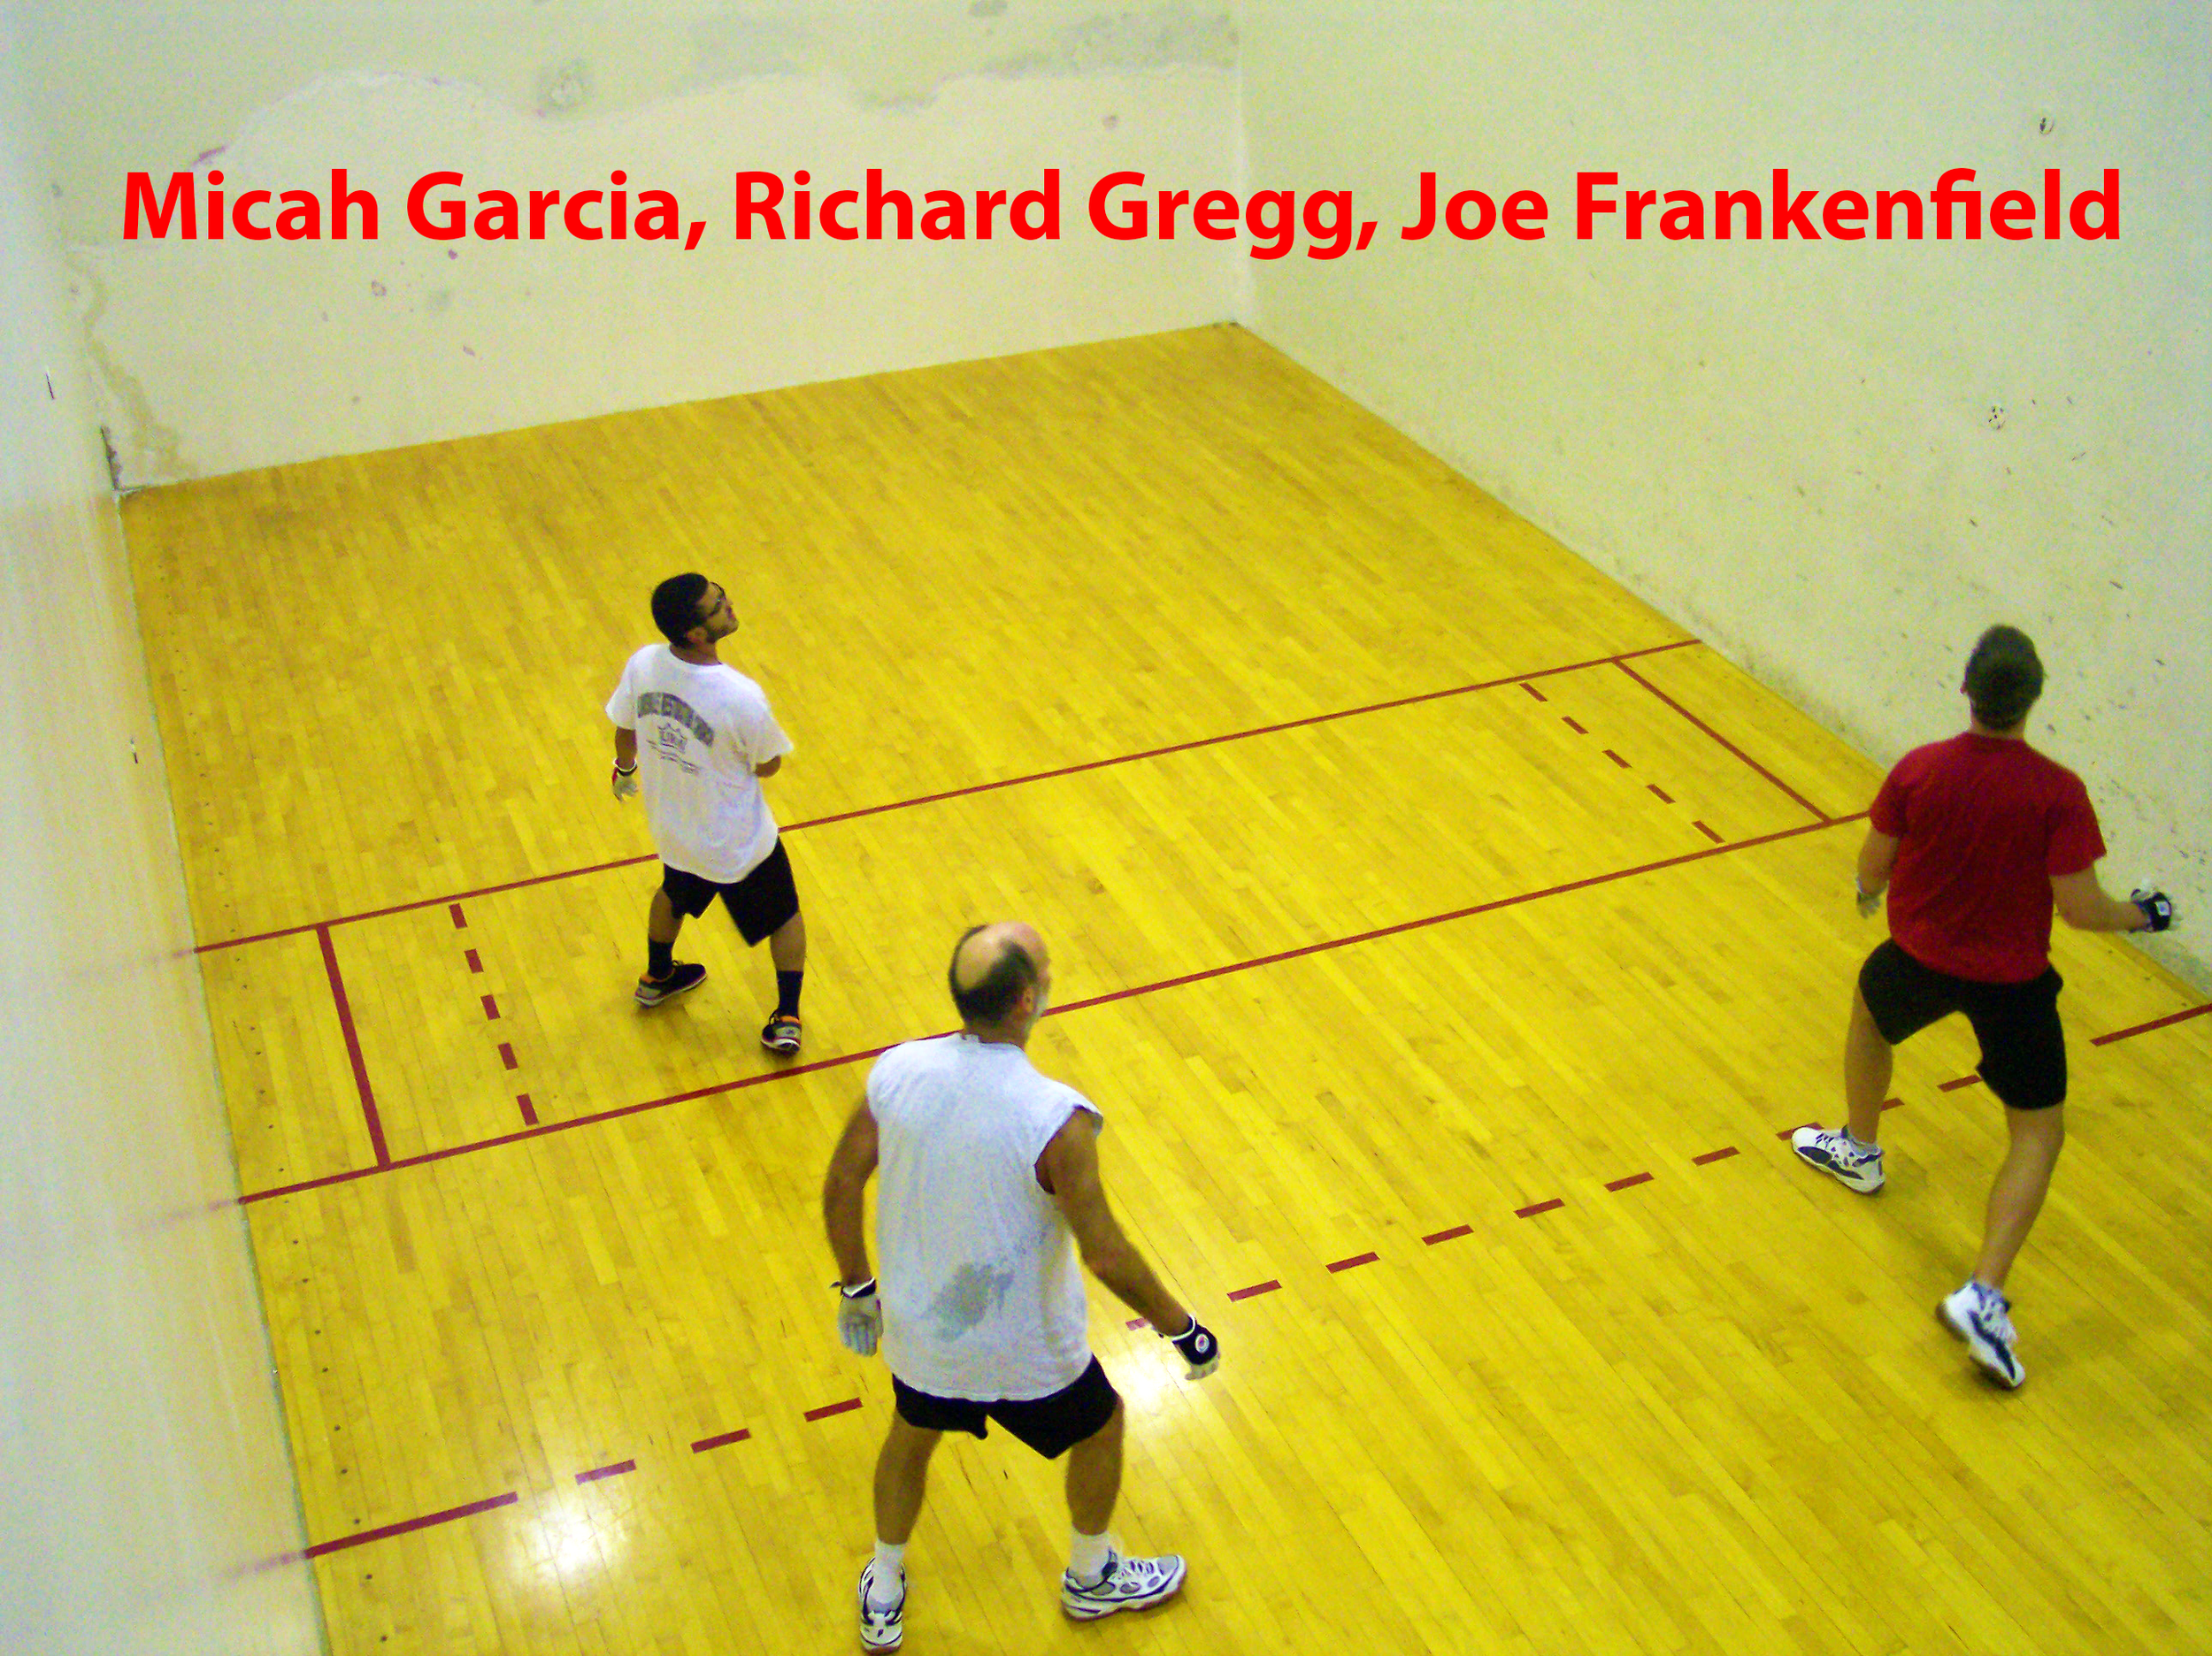 Micah Garcia, Richard Gregg, Joe Frankenfield.png